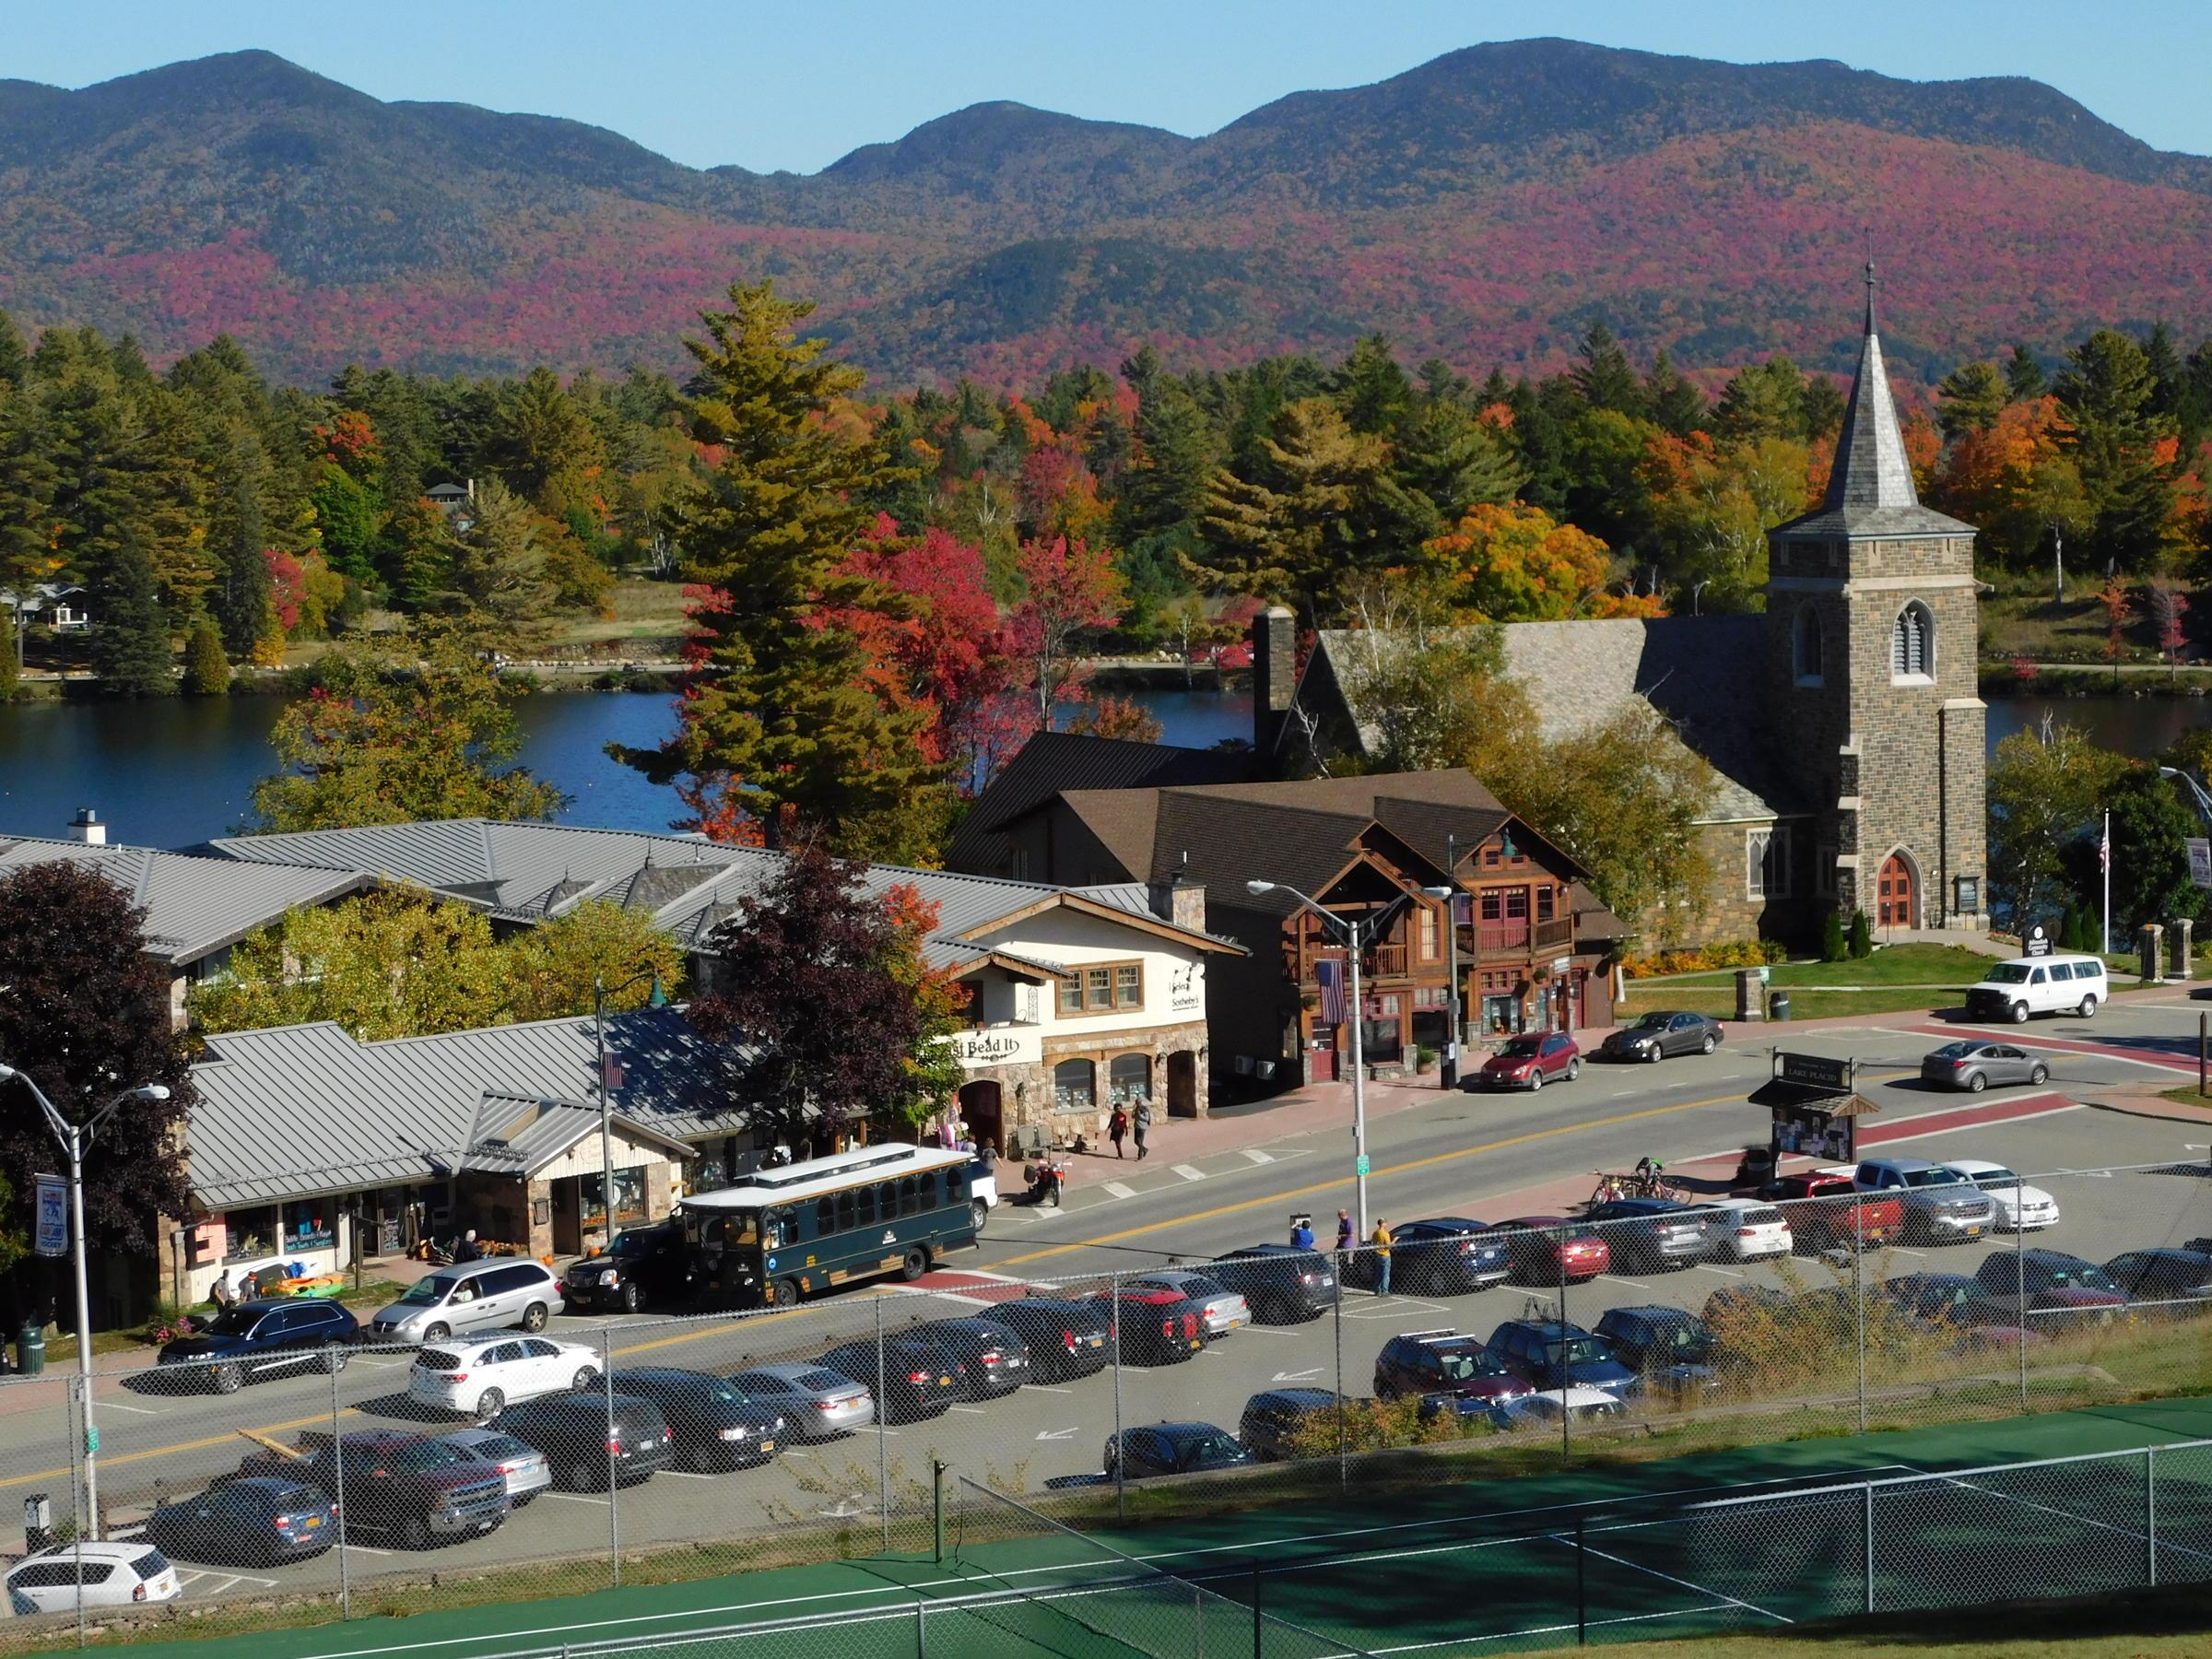 Town plans no salt zones to protect lake near lake placid for Adirondack lake house plans